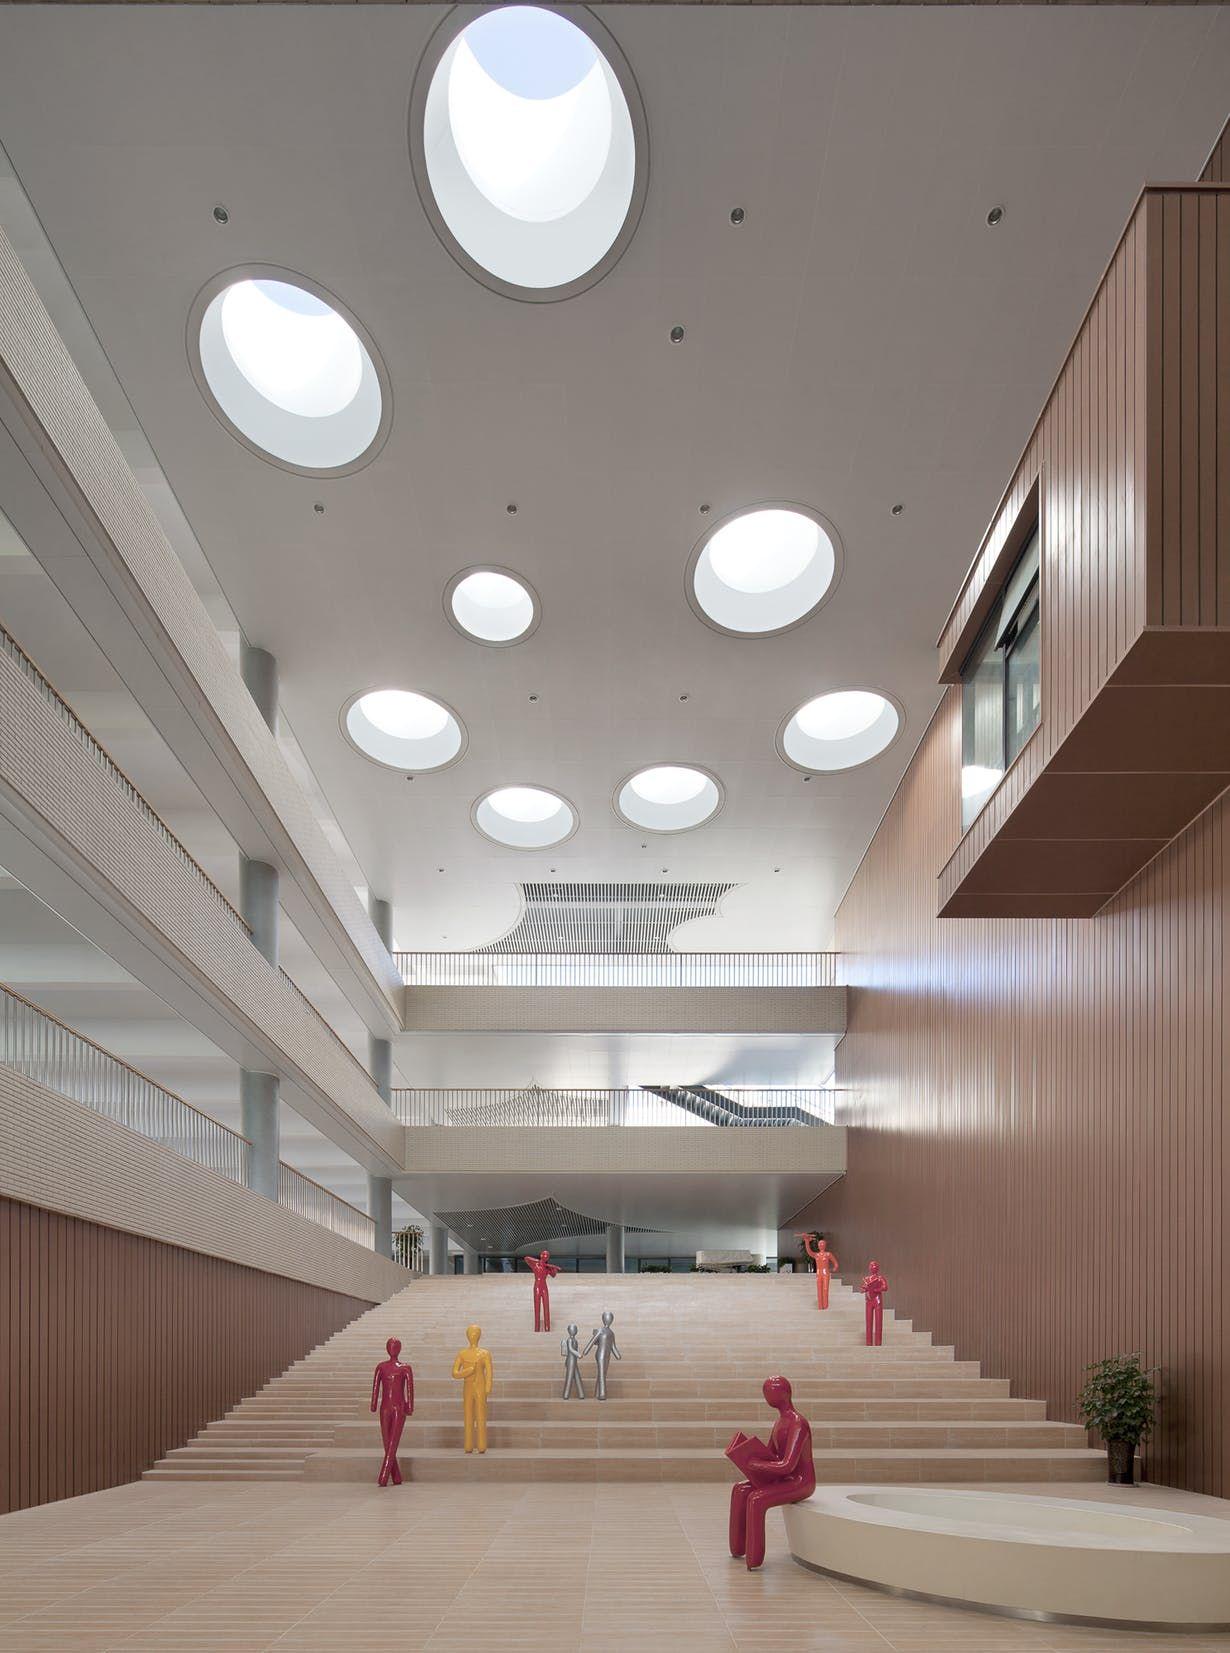 Experimental Primary School In Suzhou China